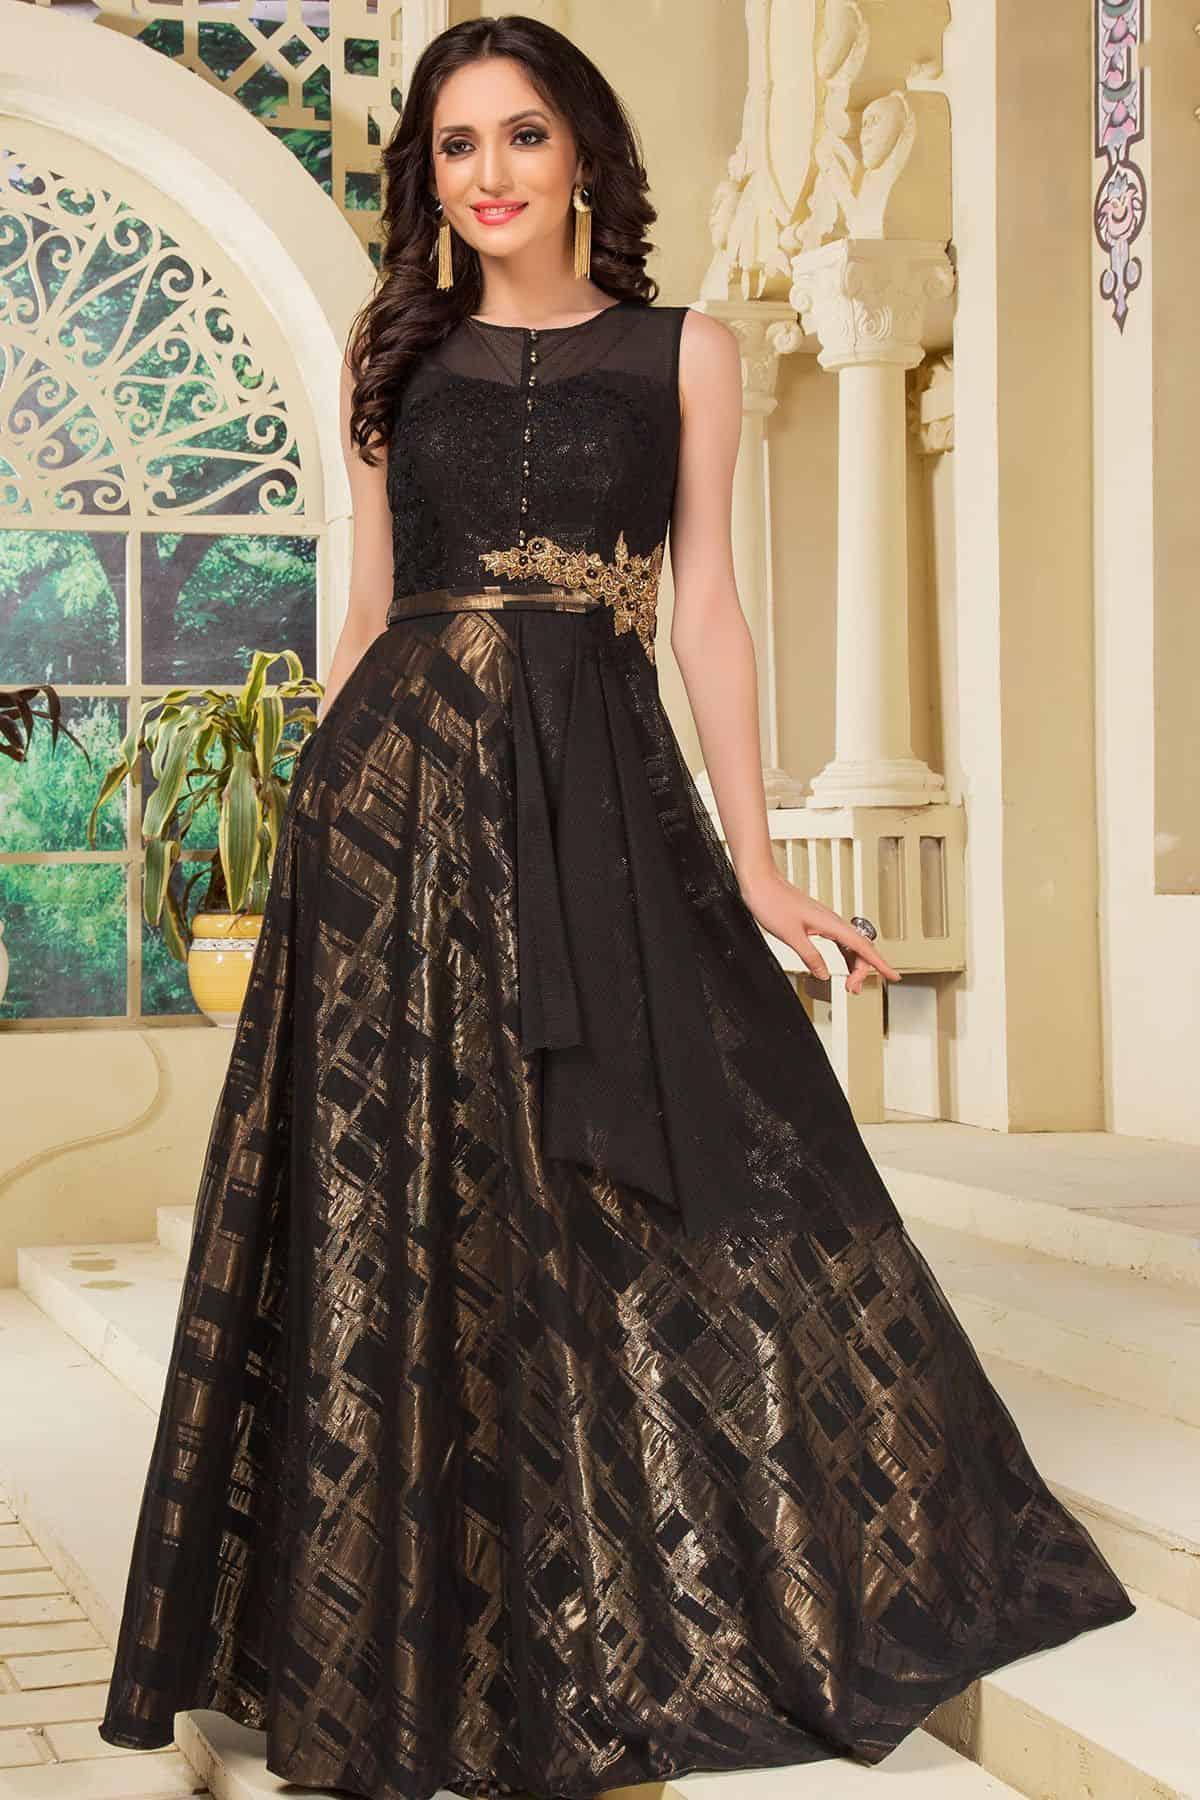 silk skirt with a plain black top